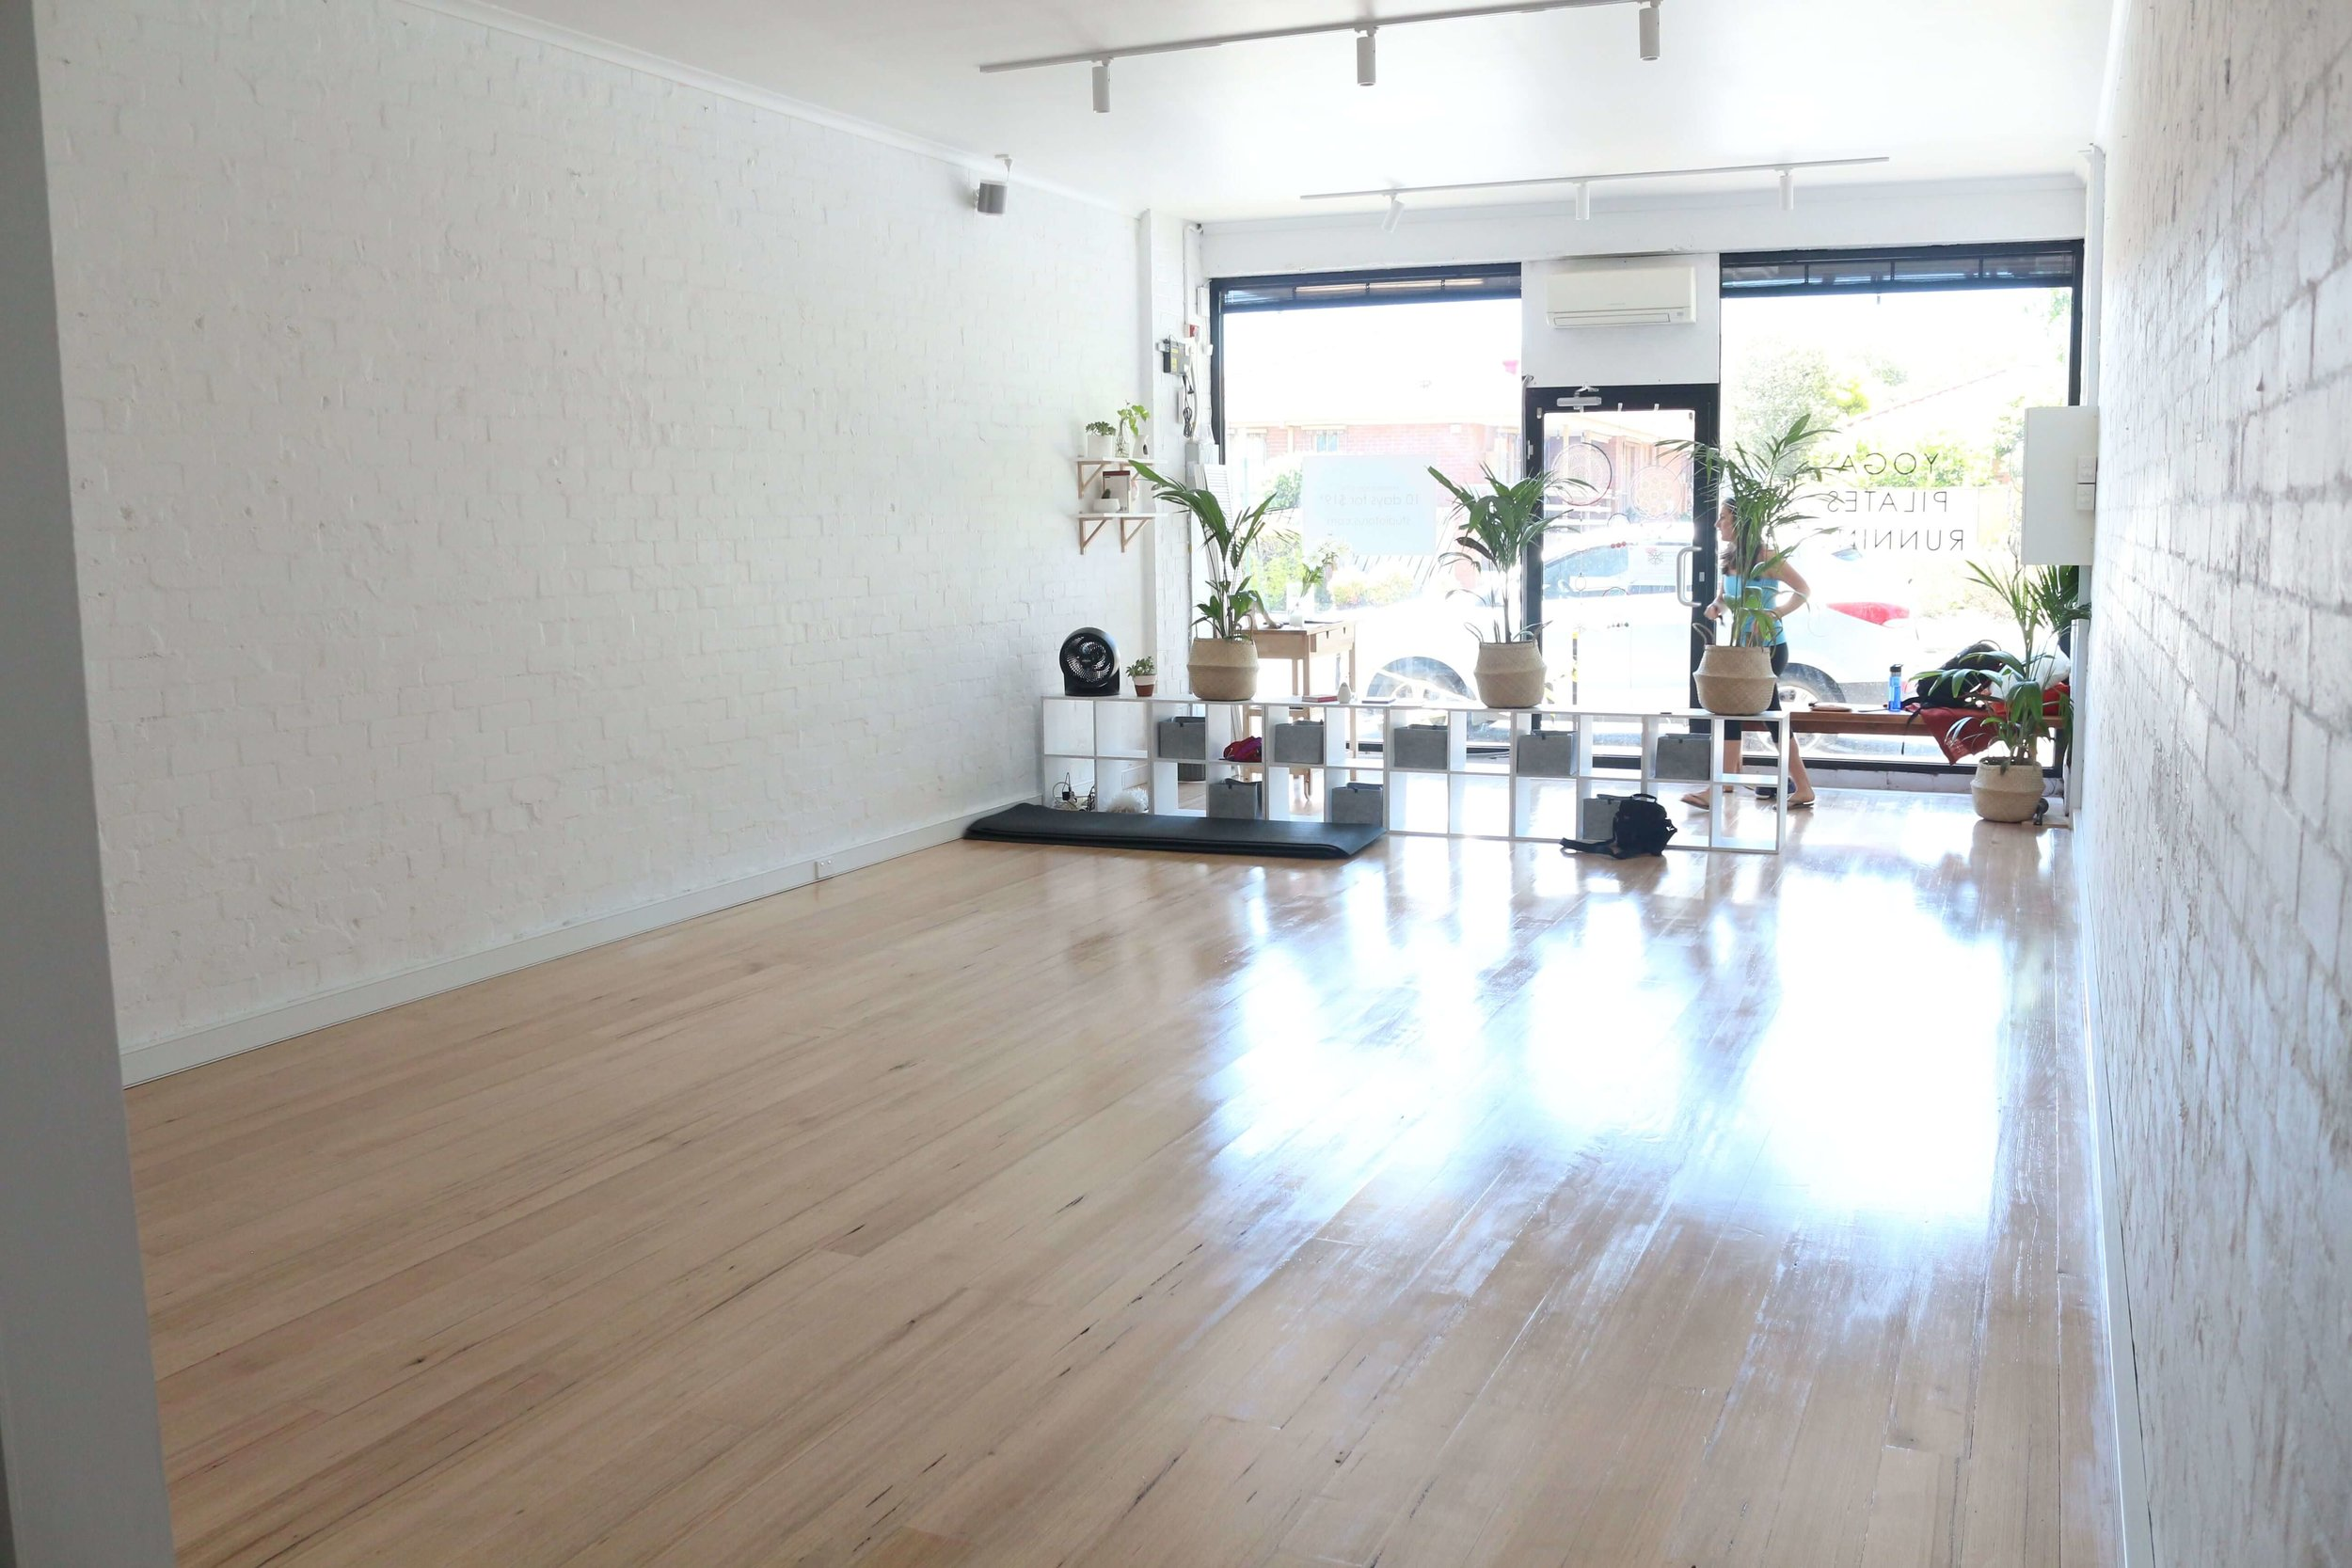 A warm, light-filled yoga studio near Doncaster - YOGA CLASSES NEAR ME | YOGA NEAR DONCASTER